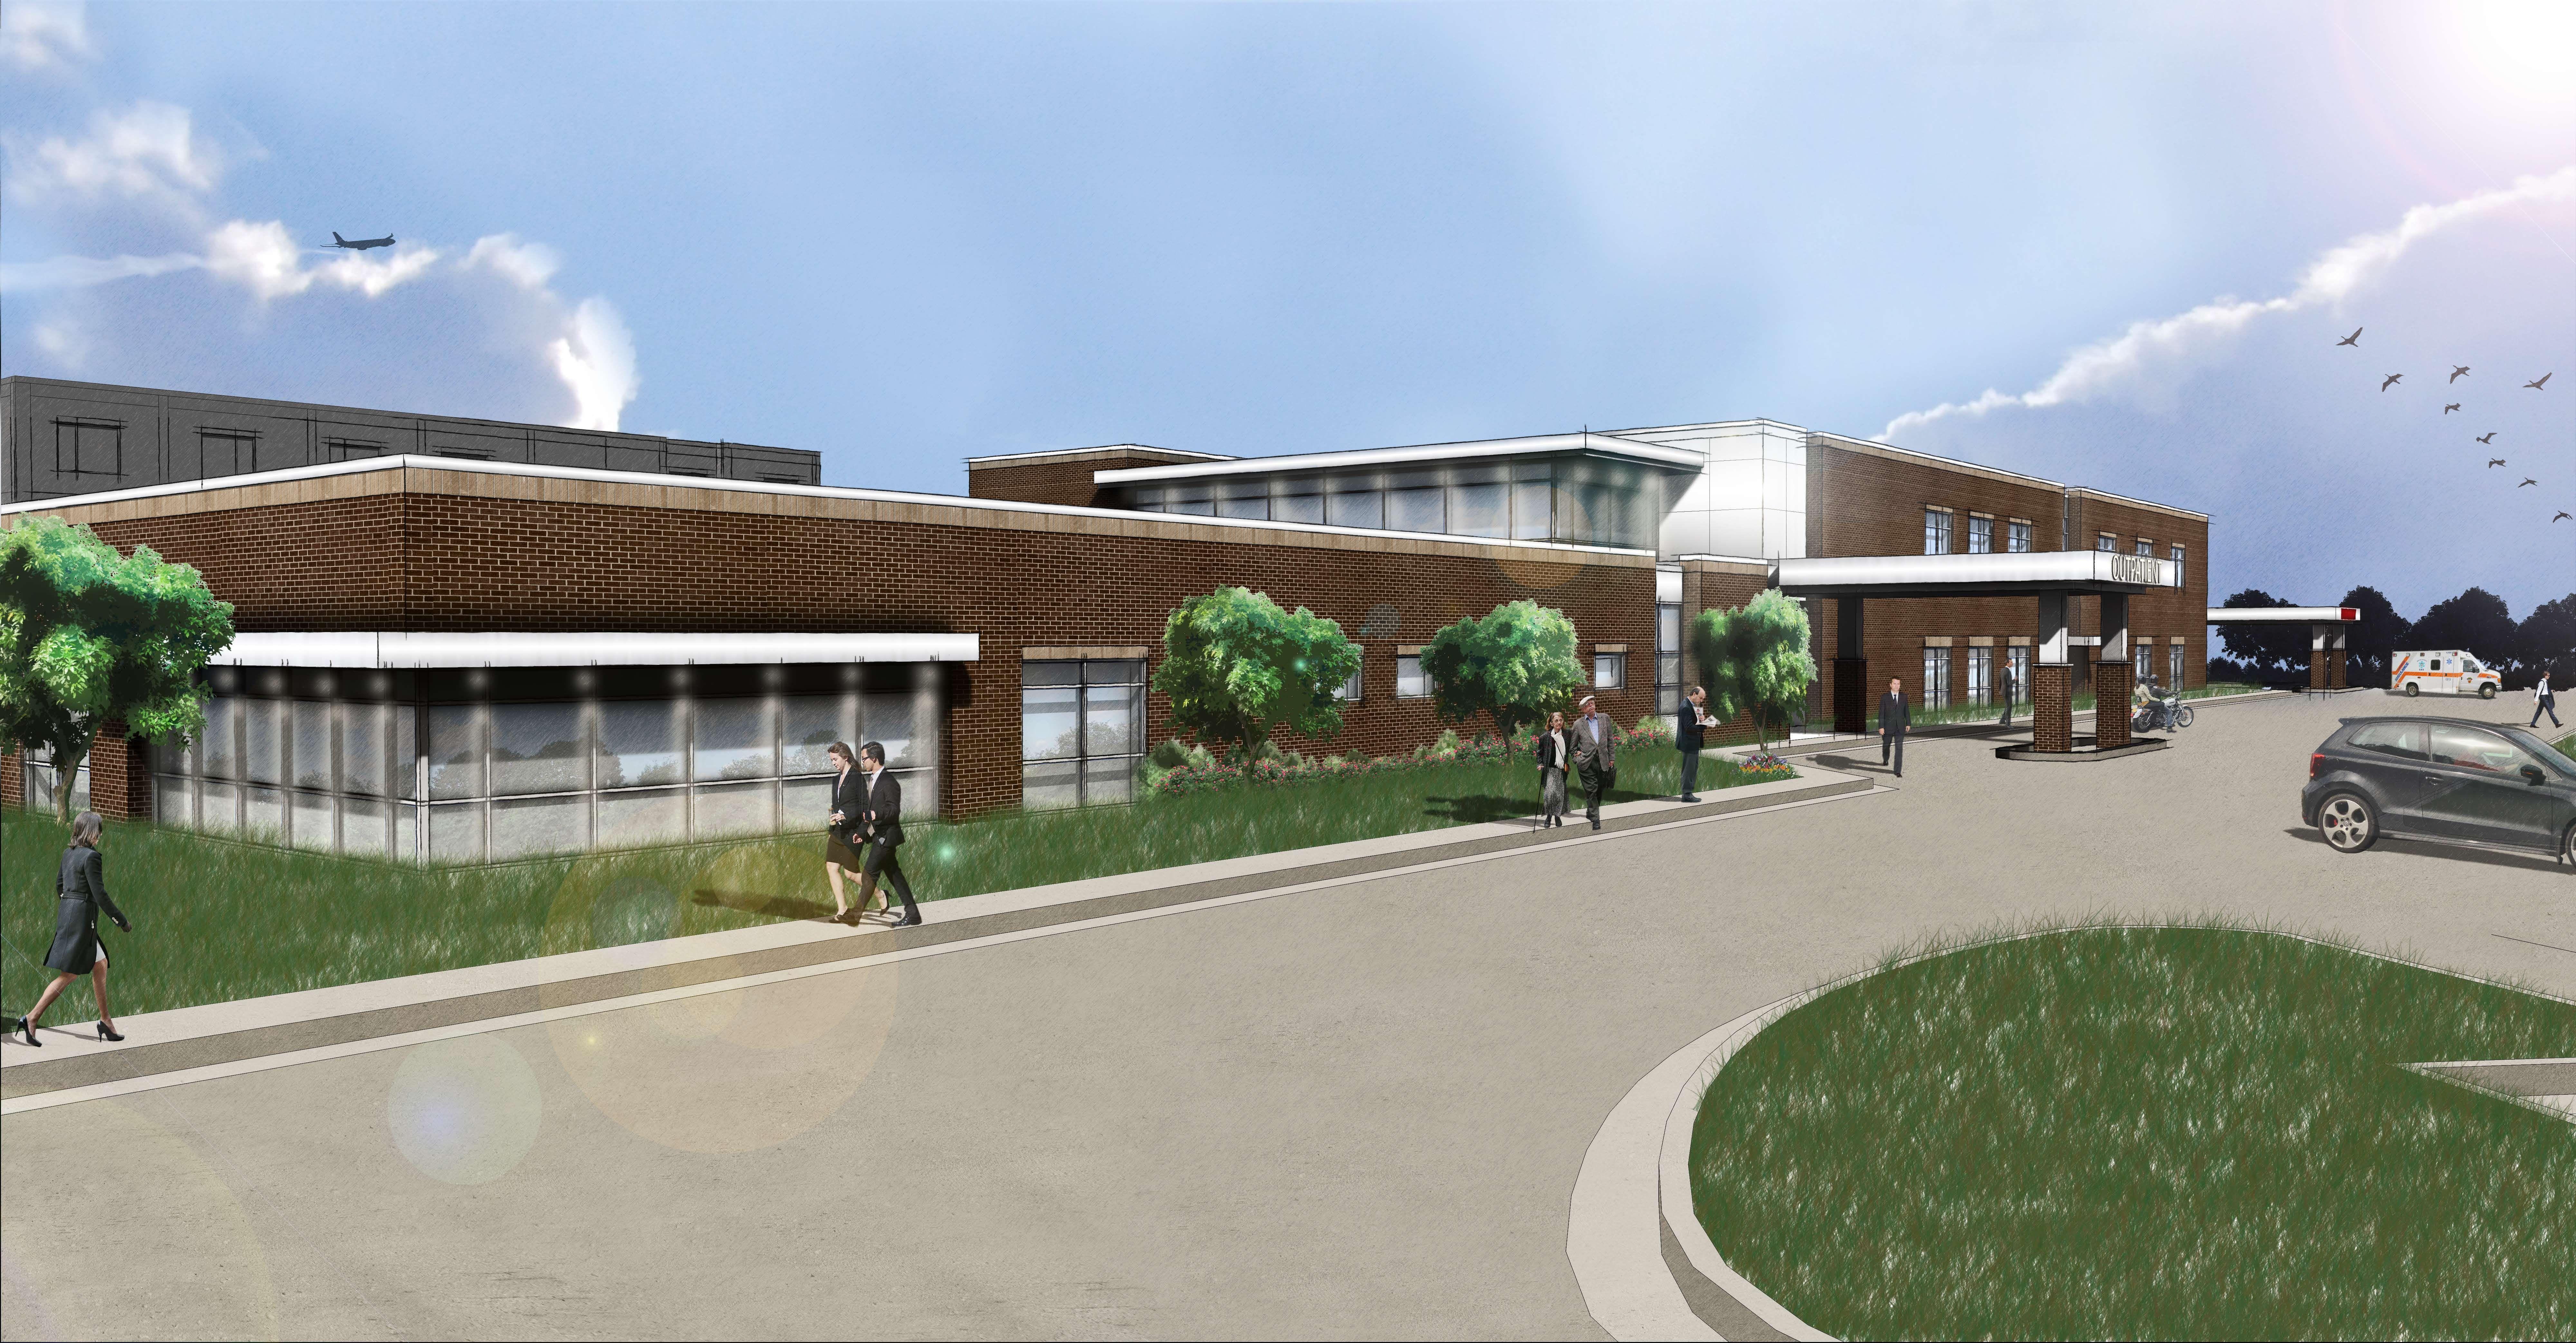 Golden valley memorial hospital outpatient expansion